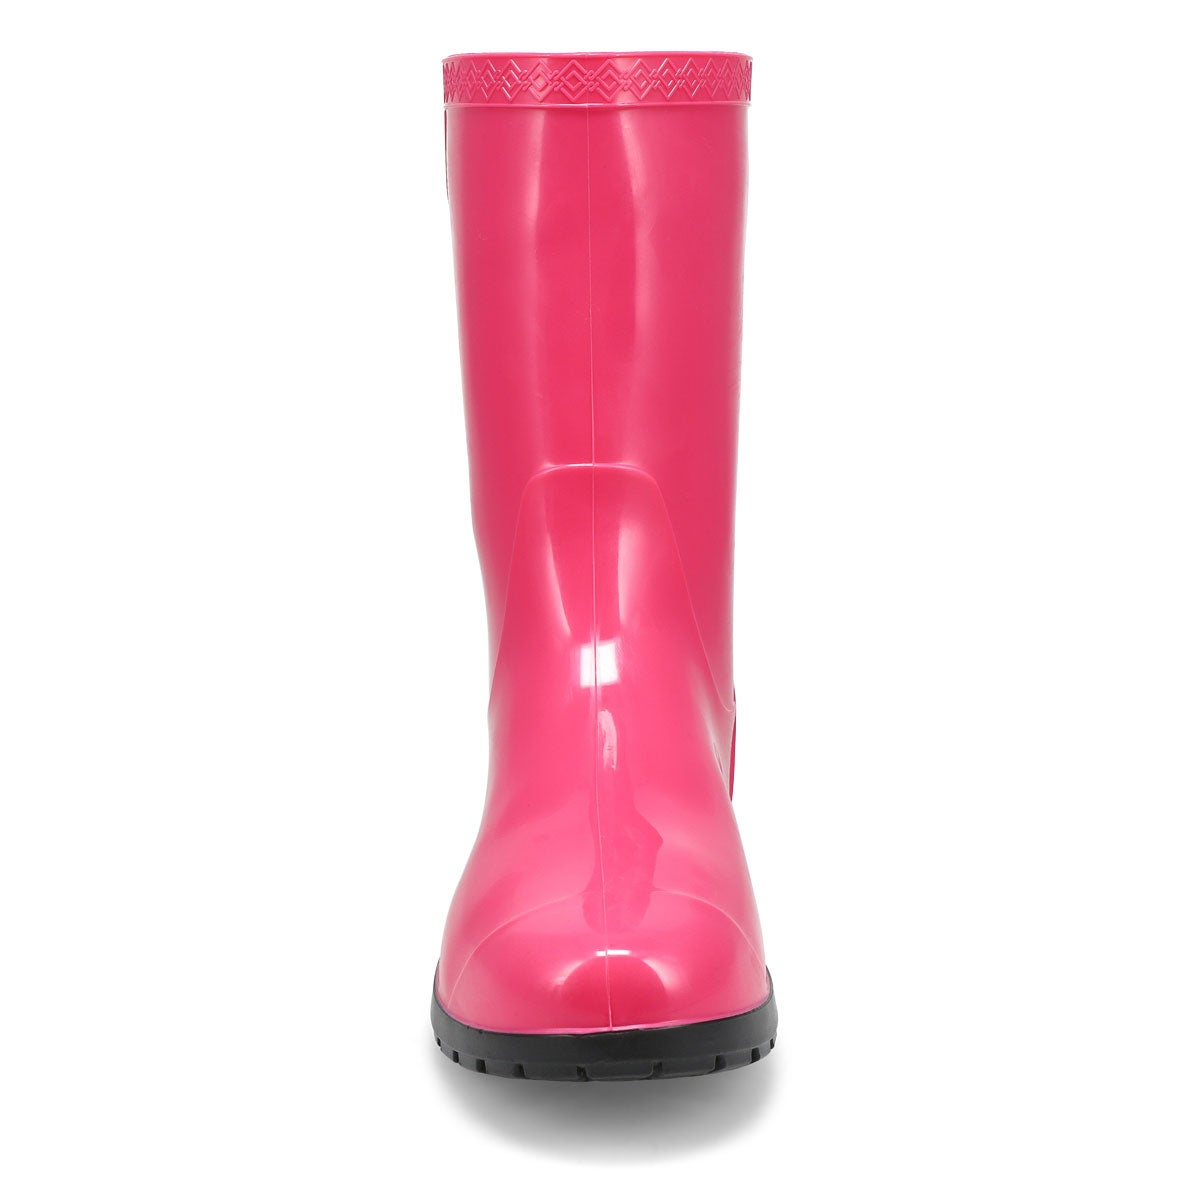 Botte de pluie Raana, rose diva, fille